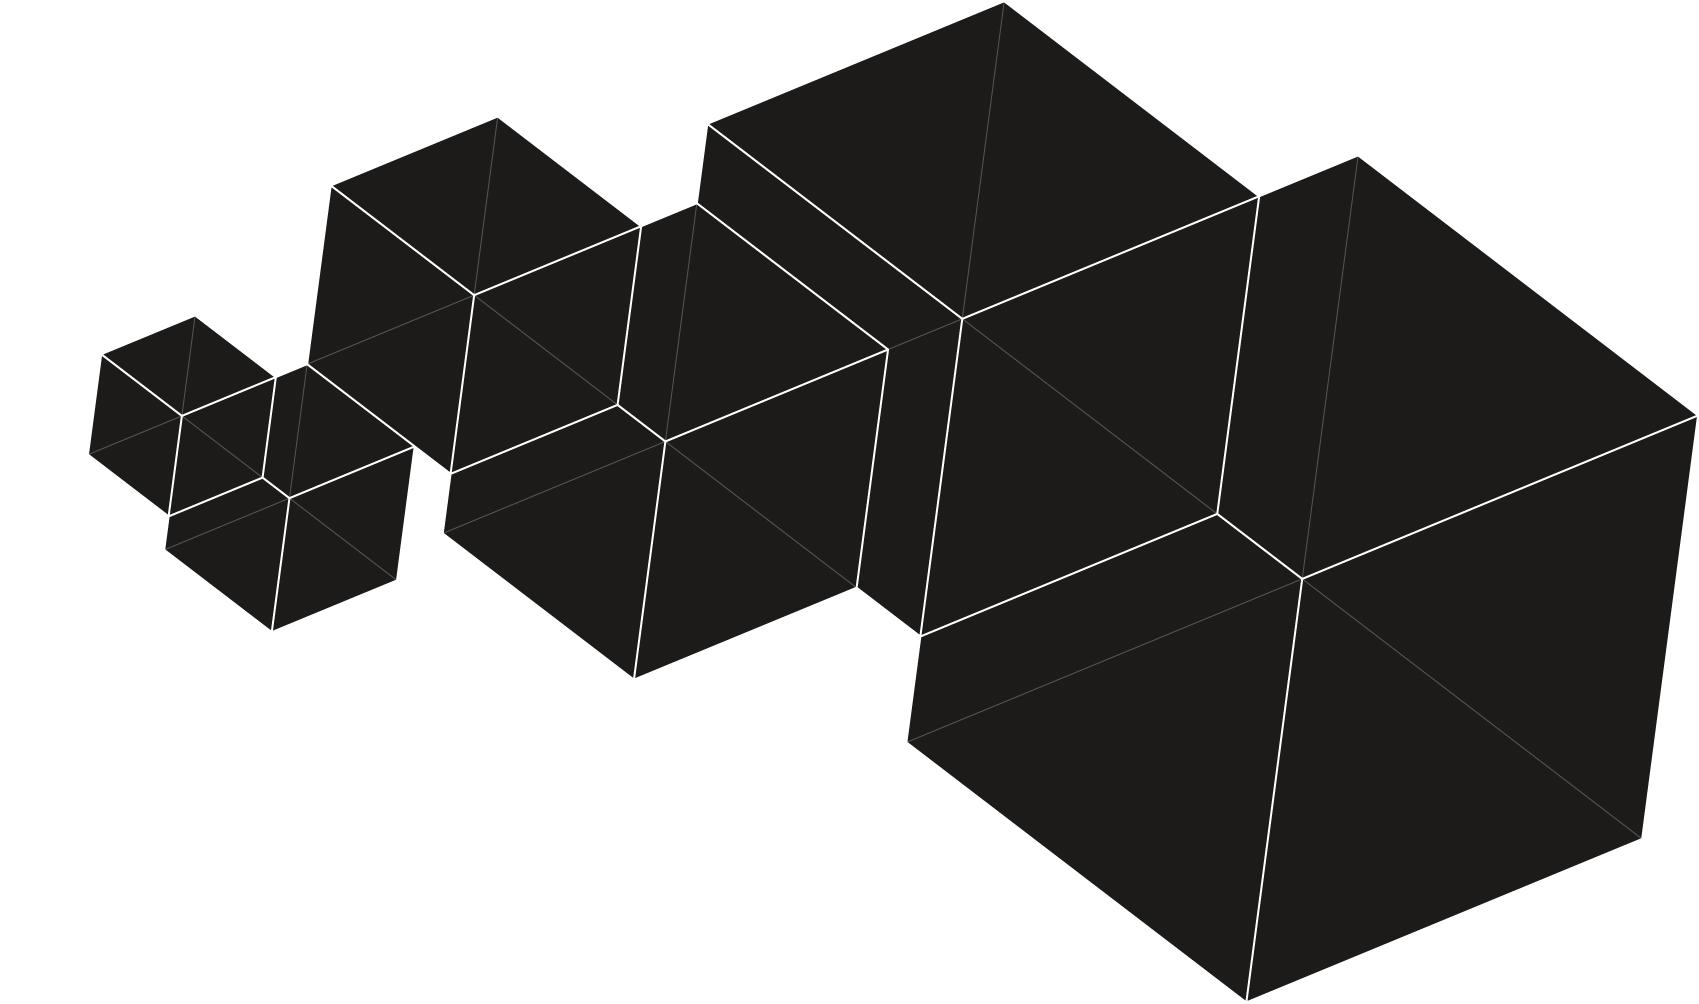 HEXAGONS_06.jpg